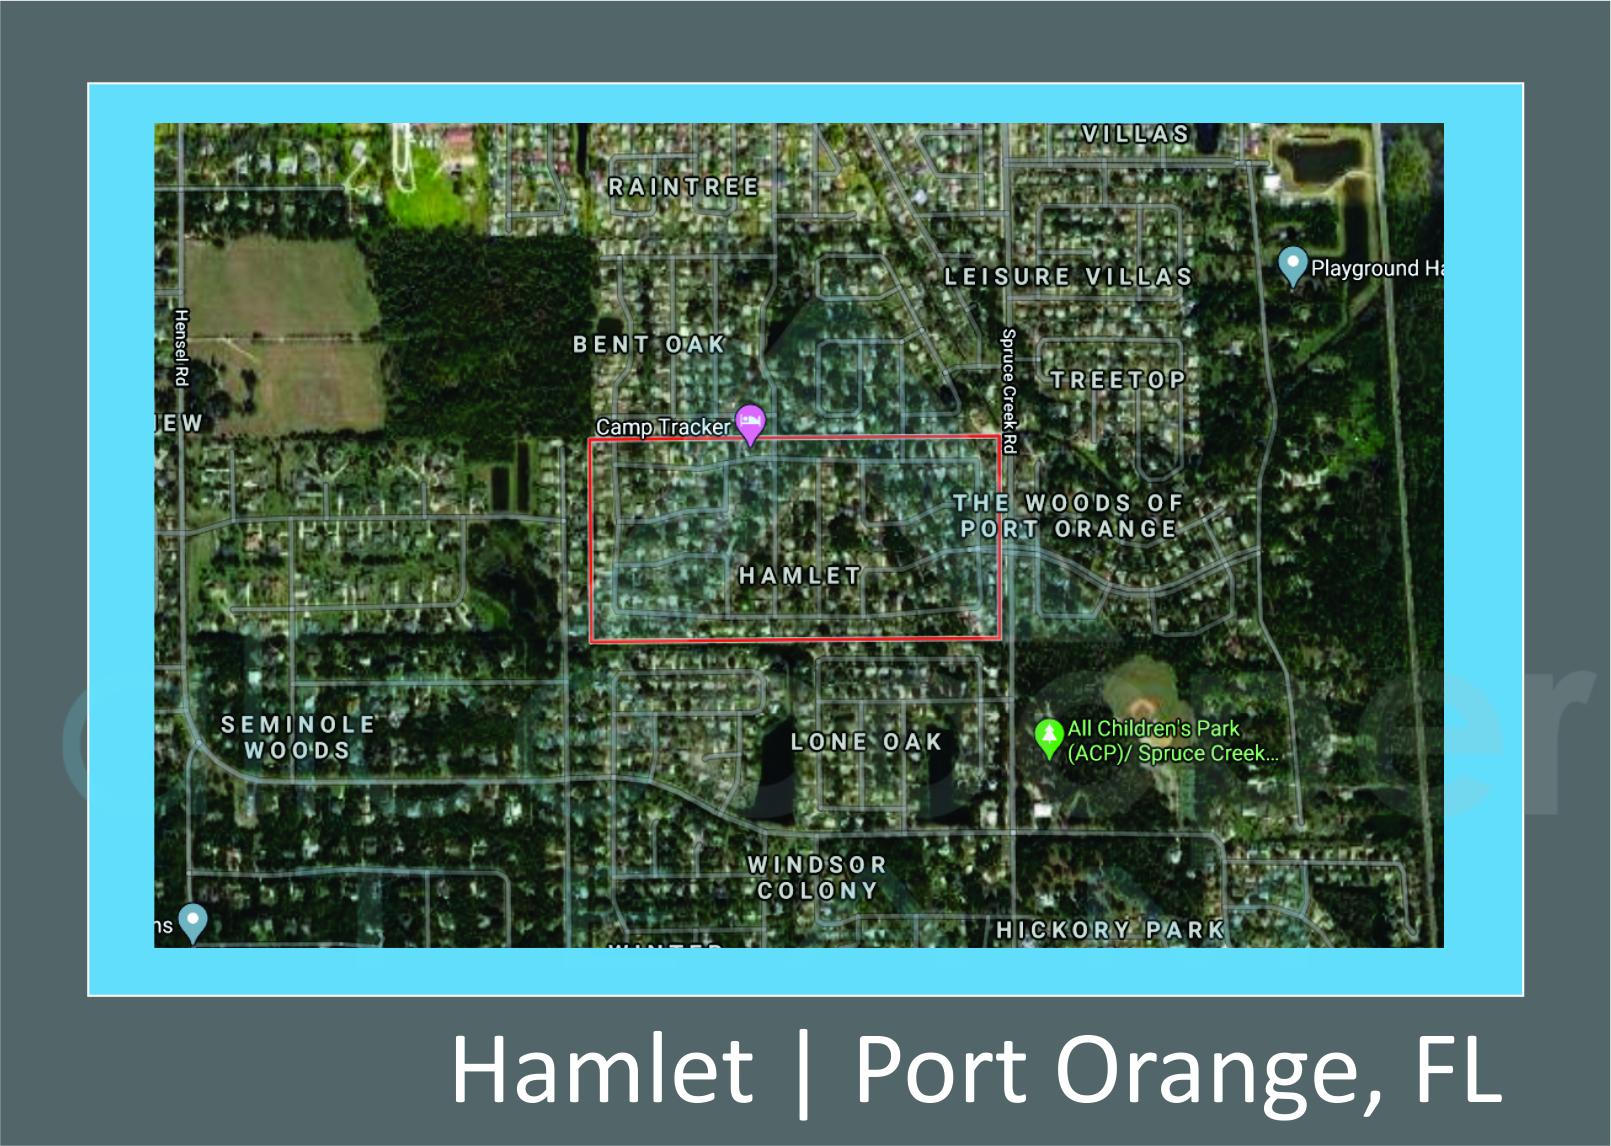 Map of Hamlet Port Orange, Fl